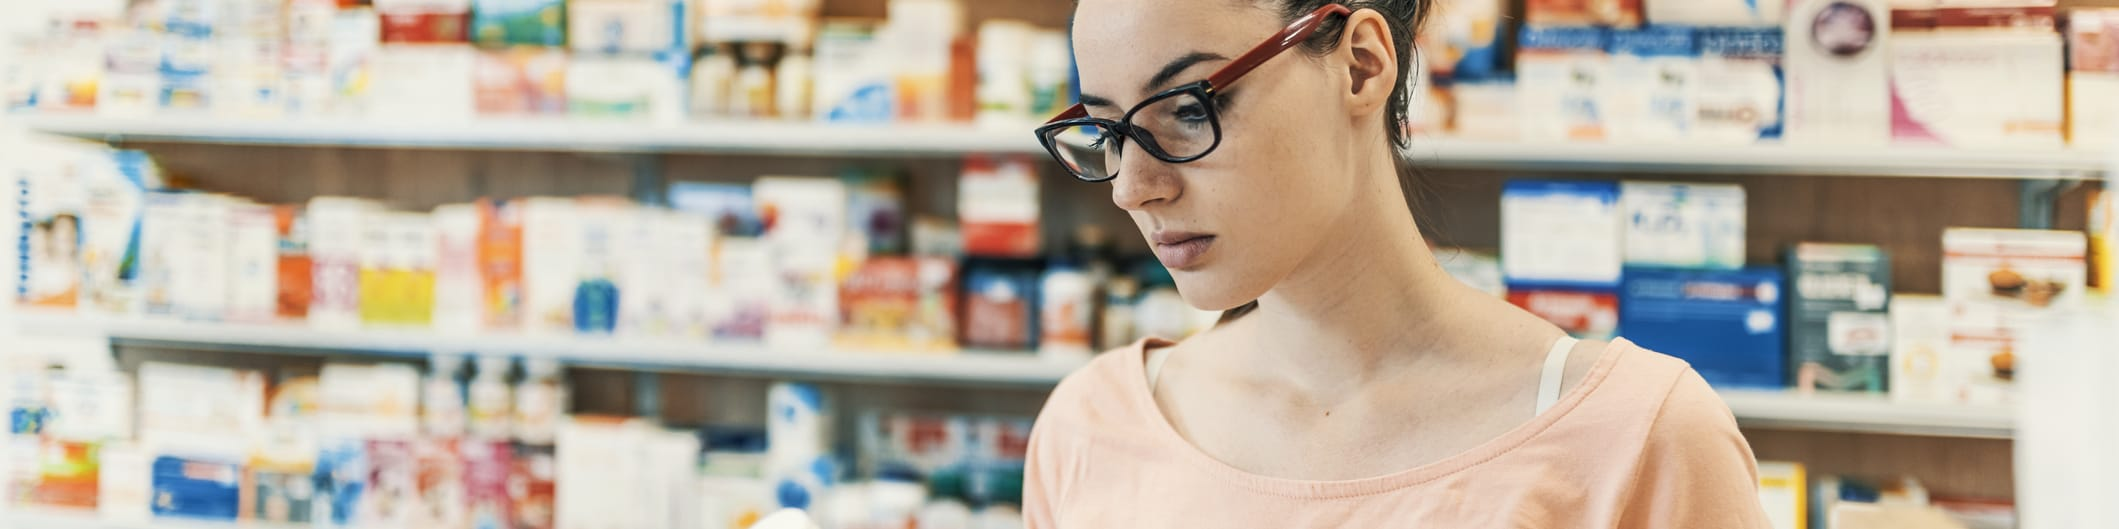 woman in drugstore